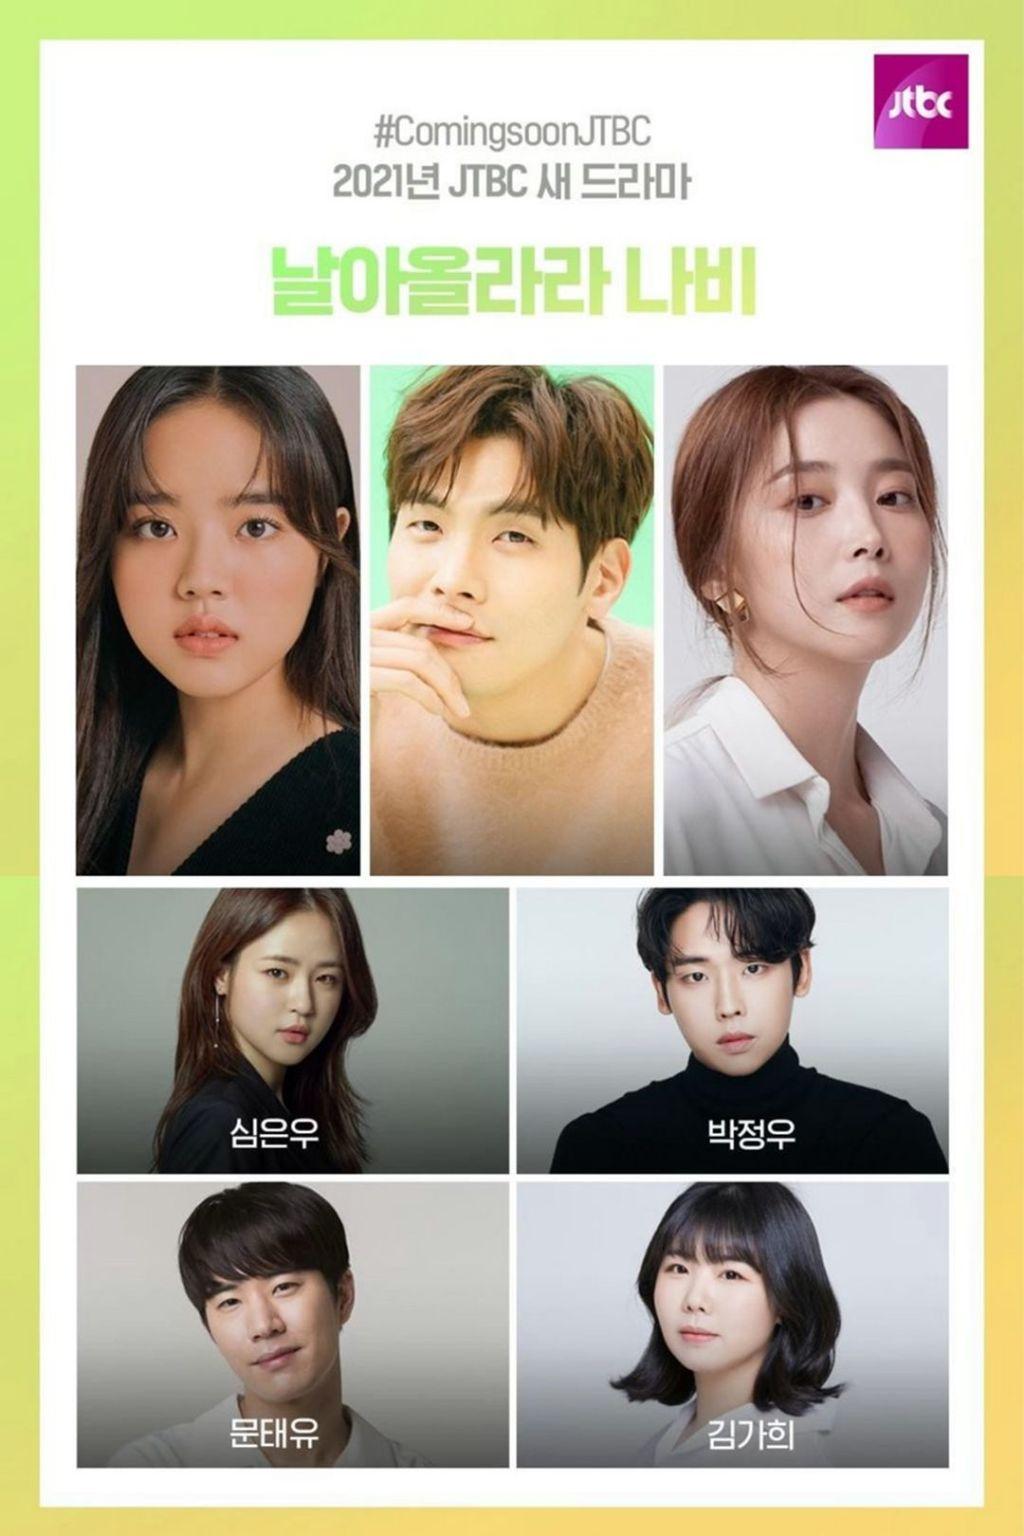 Sinopsis Dan Profil Lengkap Pemeran Drama Upcoming Fly High Butterfly (2021) Yang Akan Tayang Di jTBC